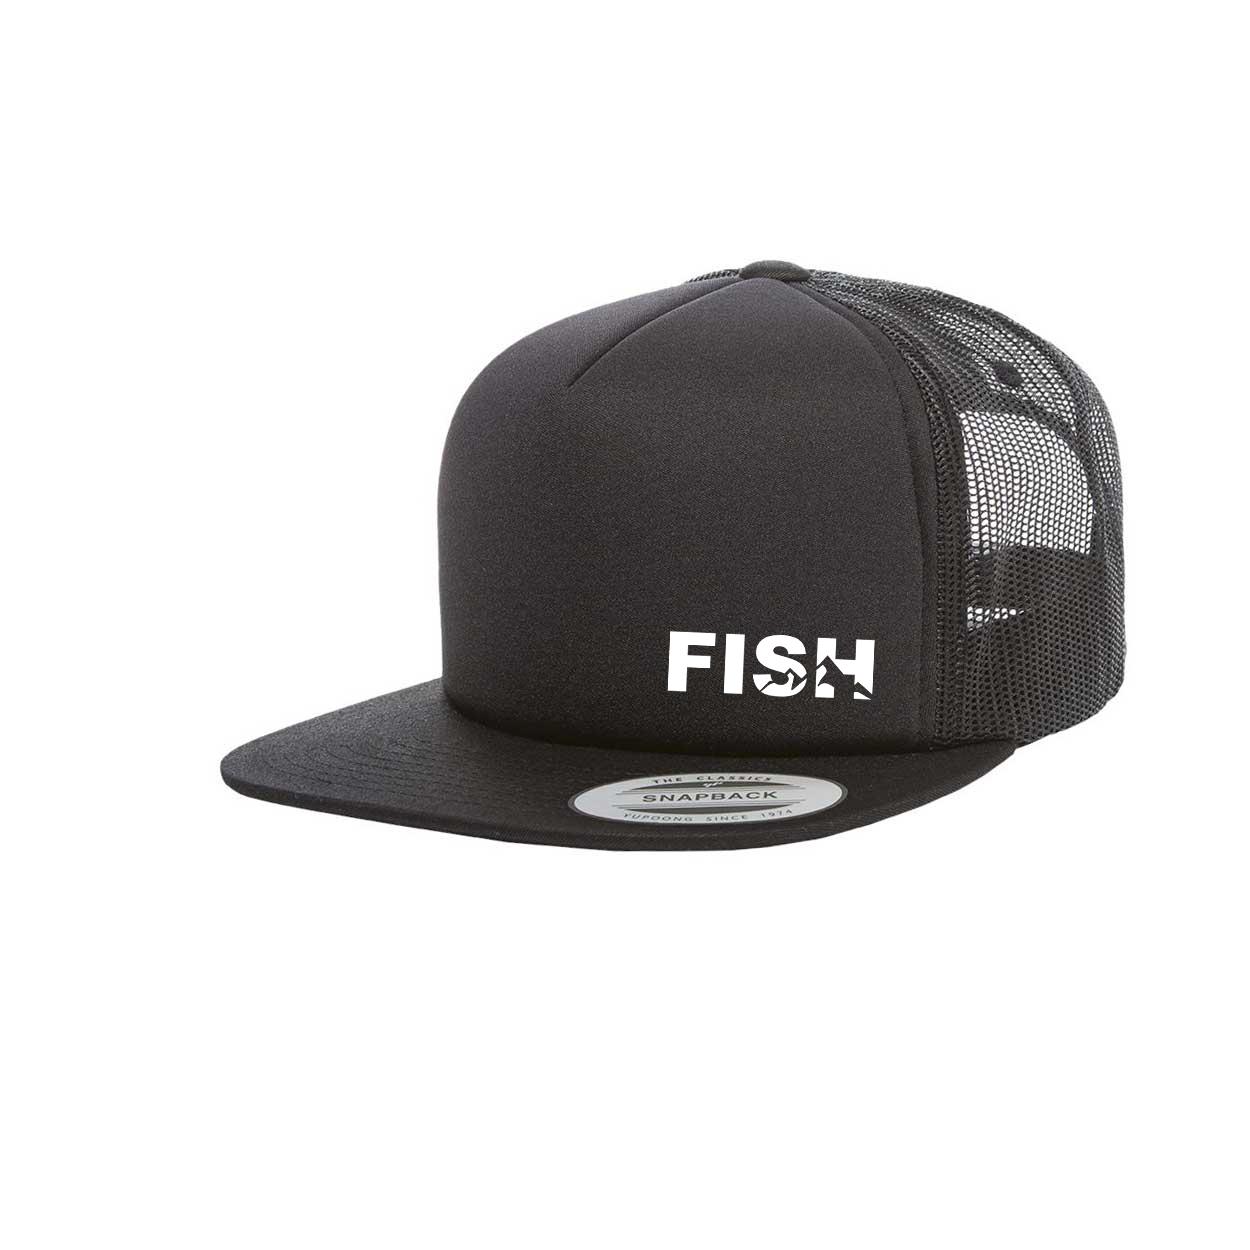 Fish Mountain Logo Night Out Premium Foam Flat Brim Snapback Hat Black (White Logo)